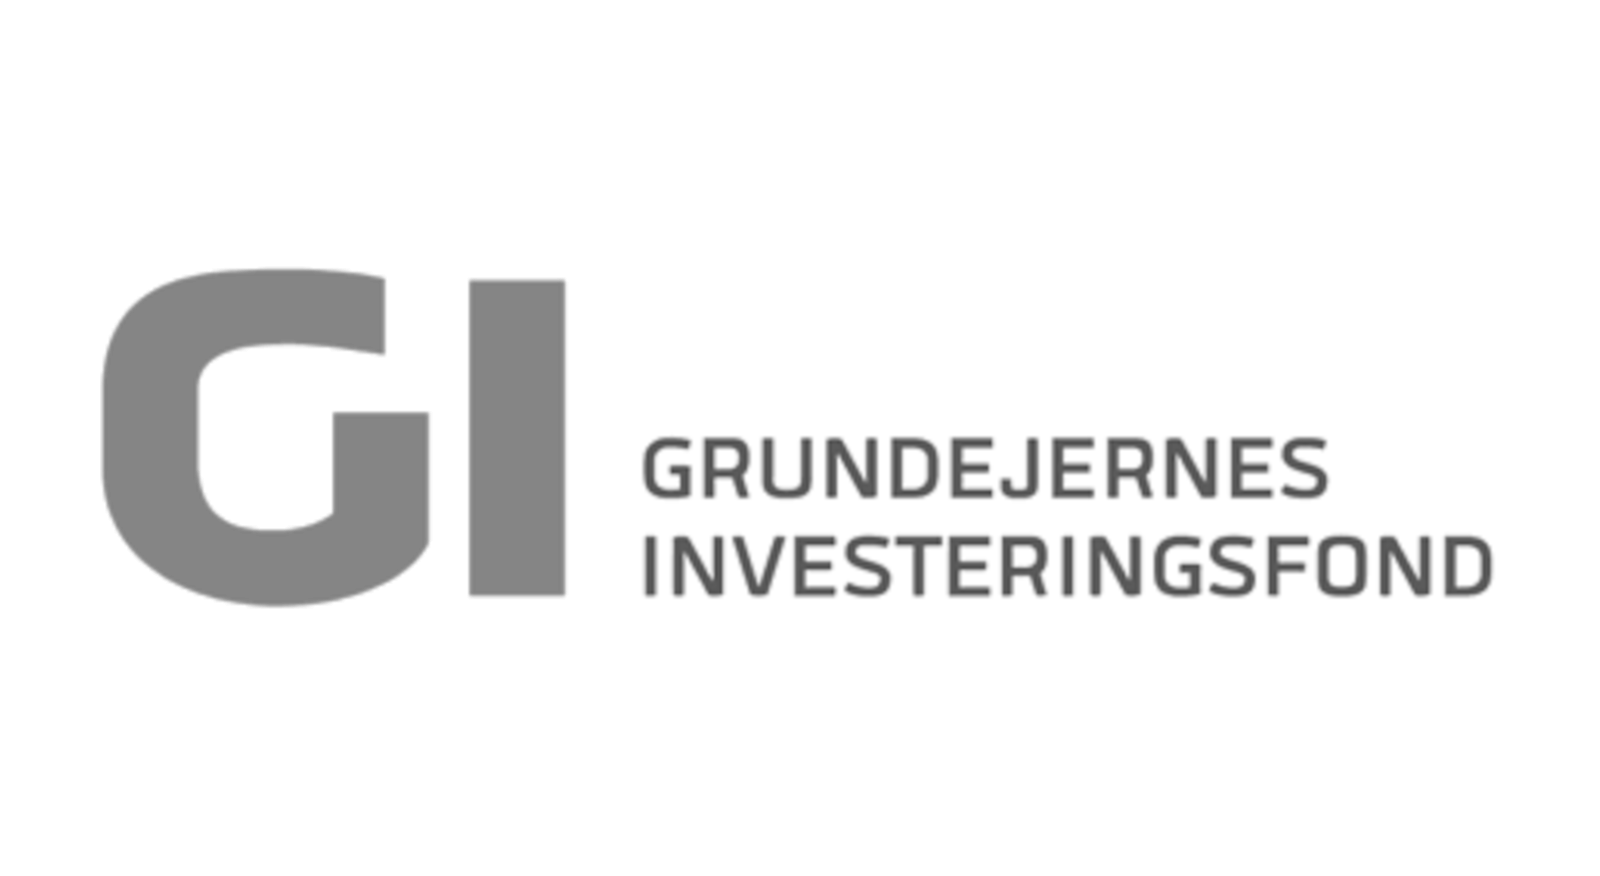 grundejernes-investeringsfond-grayscaled-2